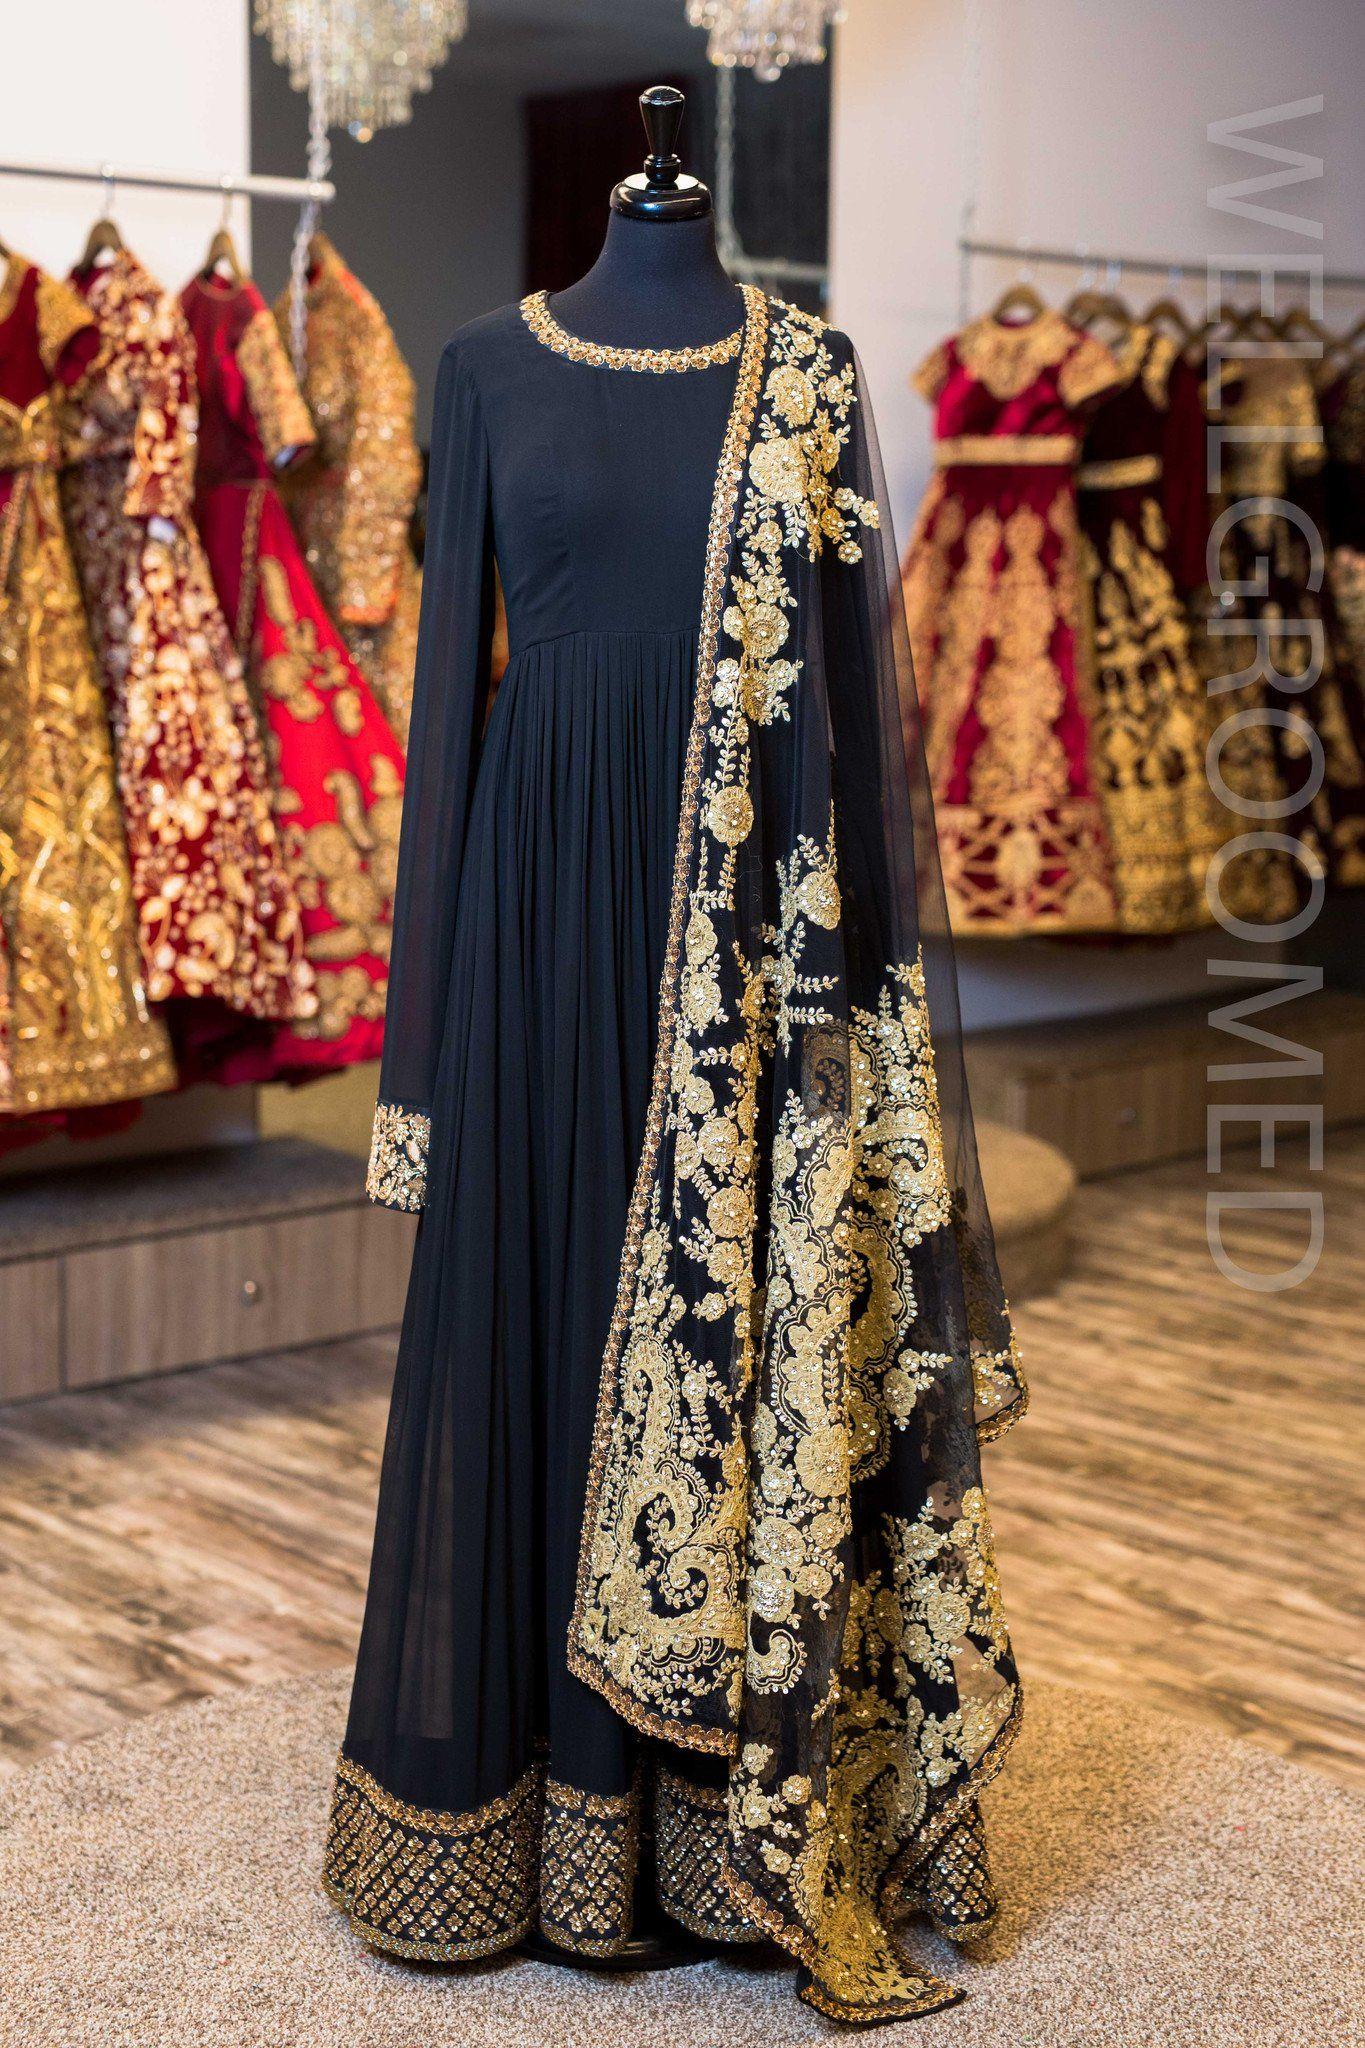 Is a black dress ok to wear to a wedding  Black Georgette Anarkali W Embroidered Dupatta  Abhiu Style